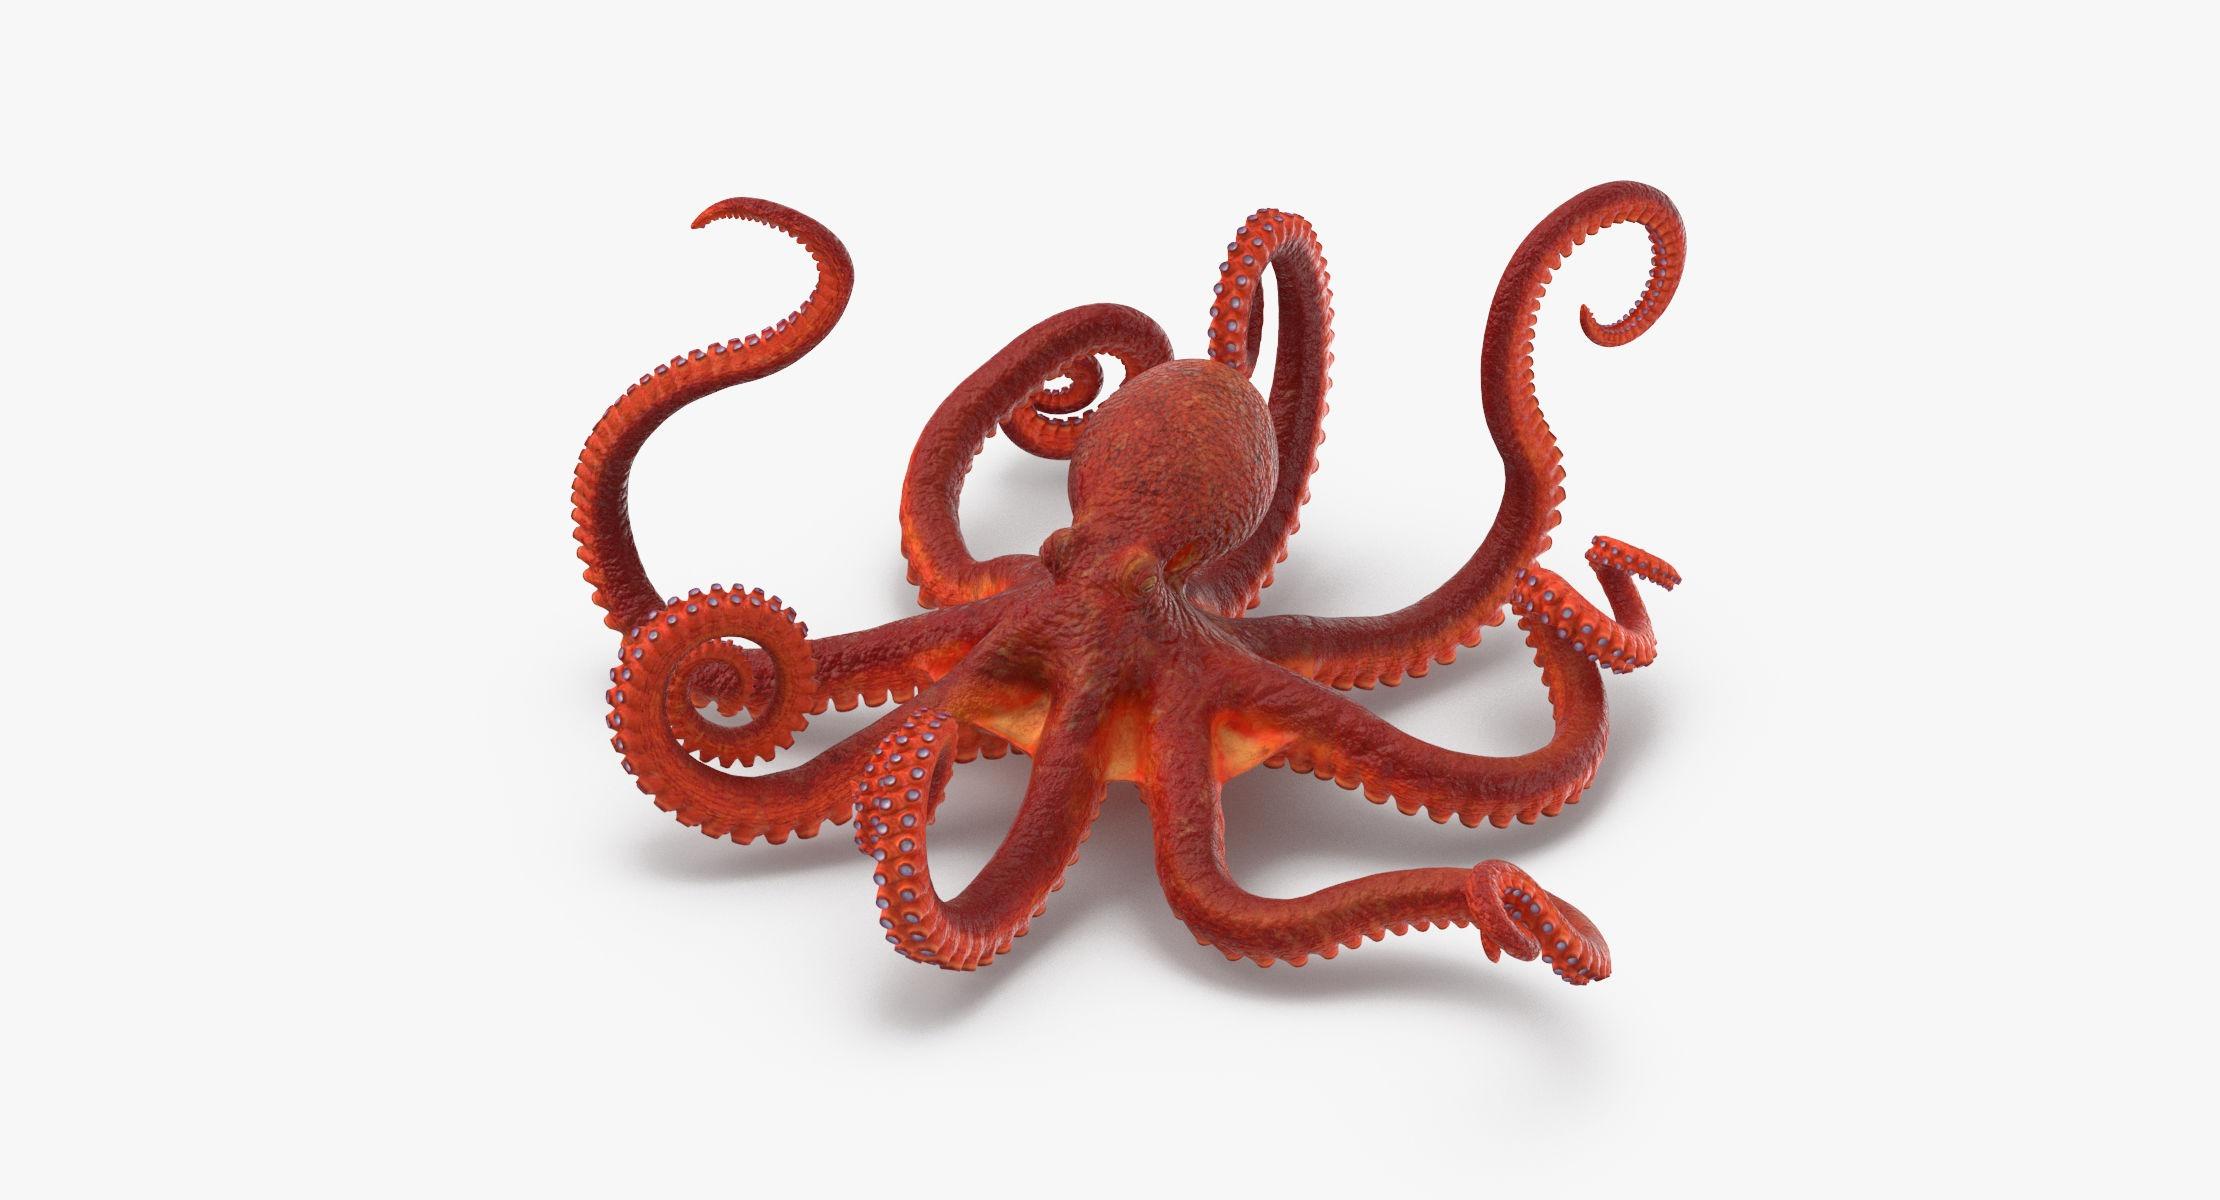 Octopus - Rigged - reel 1